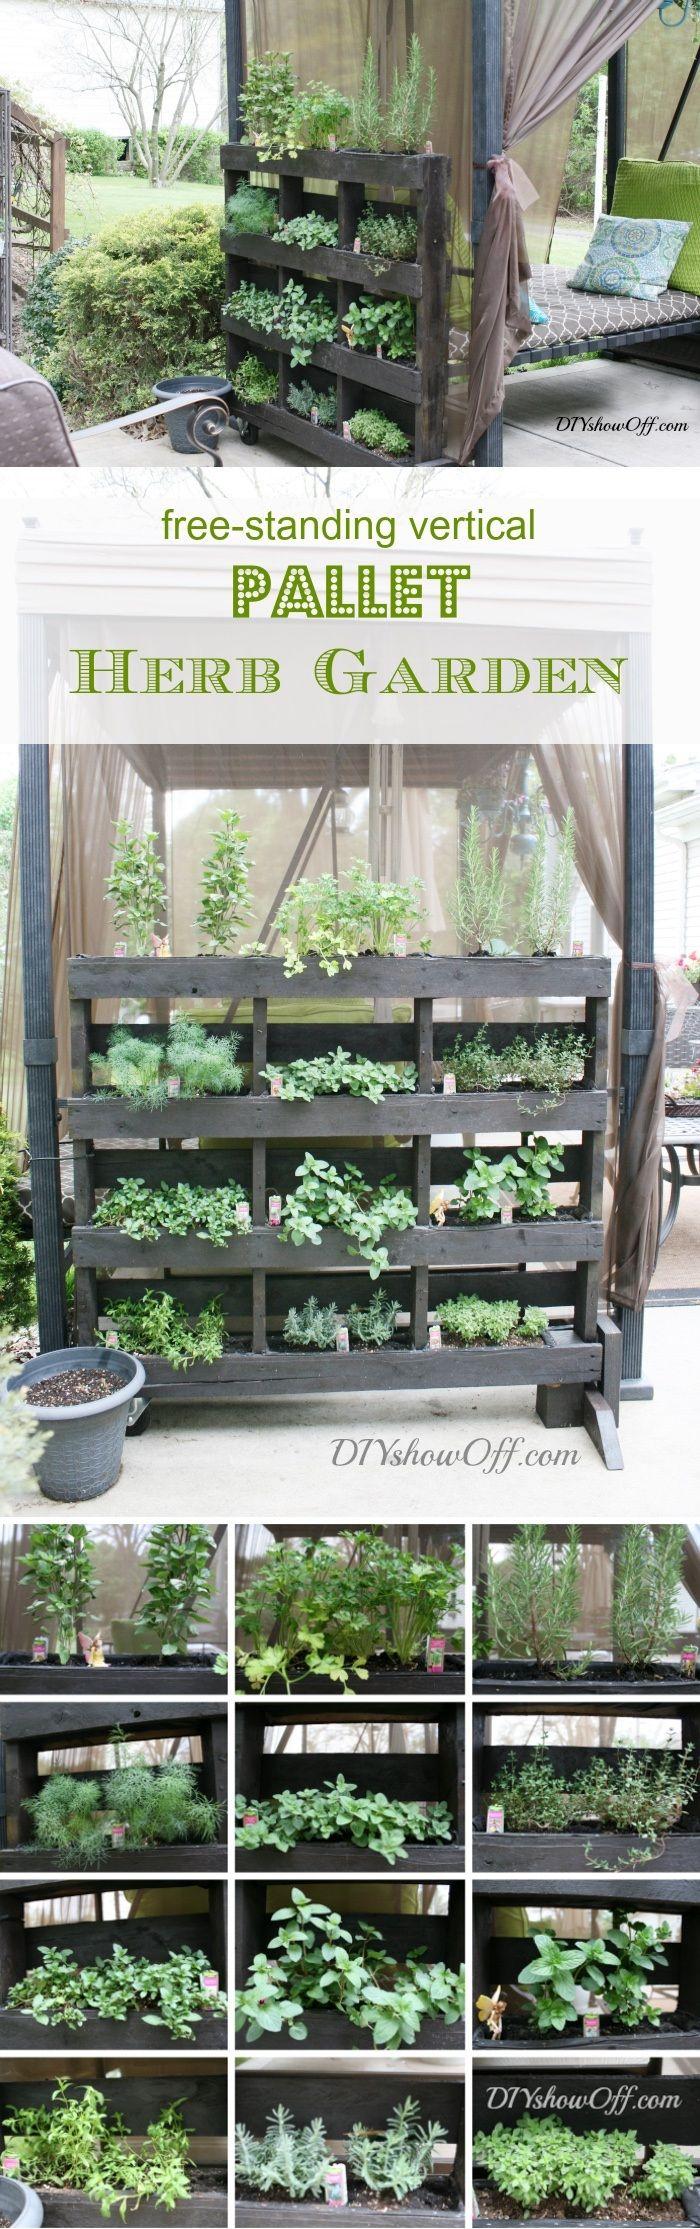 19 Inspiring DIY Pallet Planter Ideas | Pallet herb gardens, Herbs ...